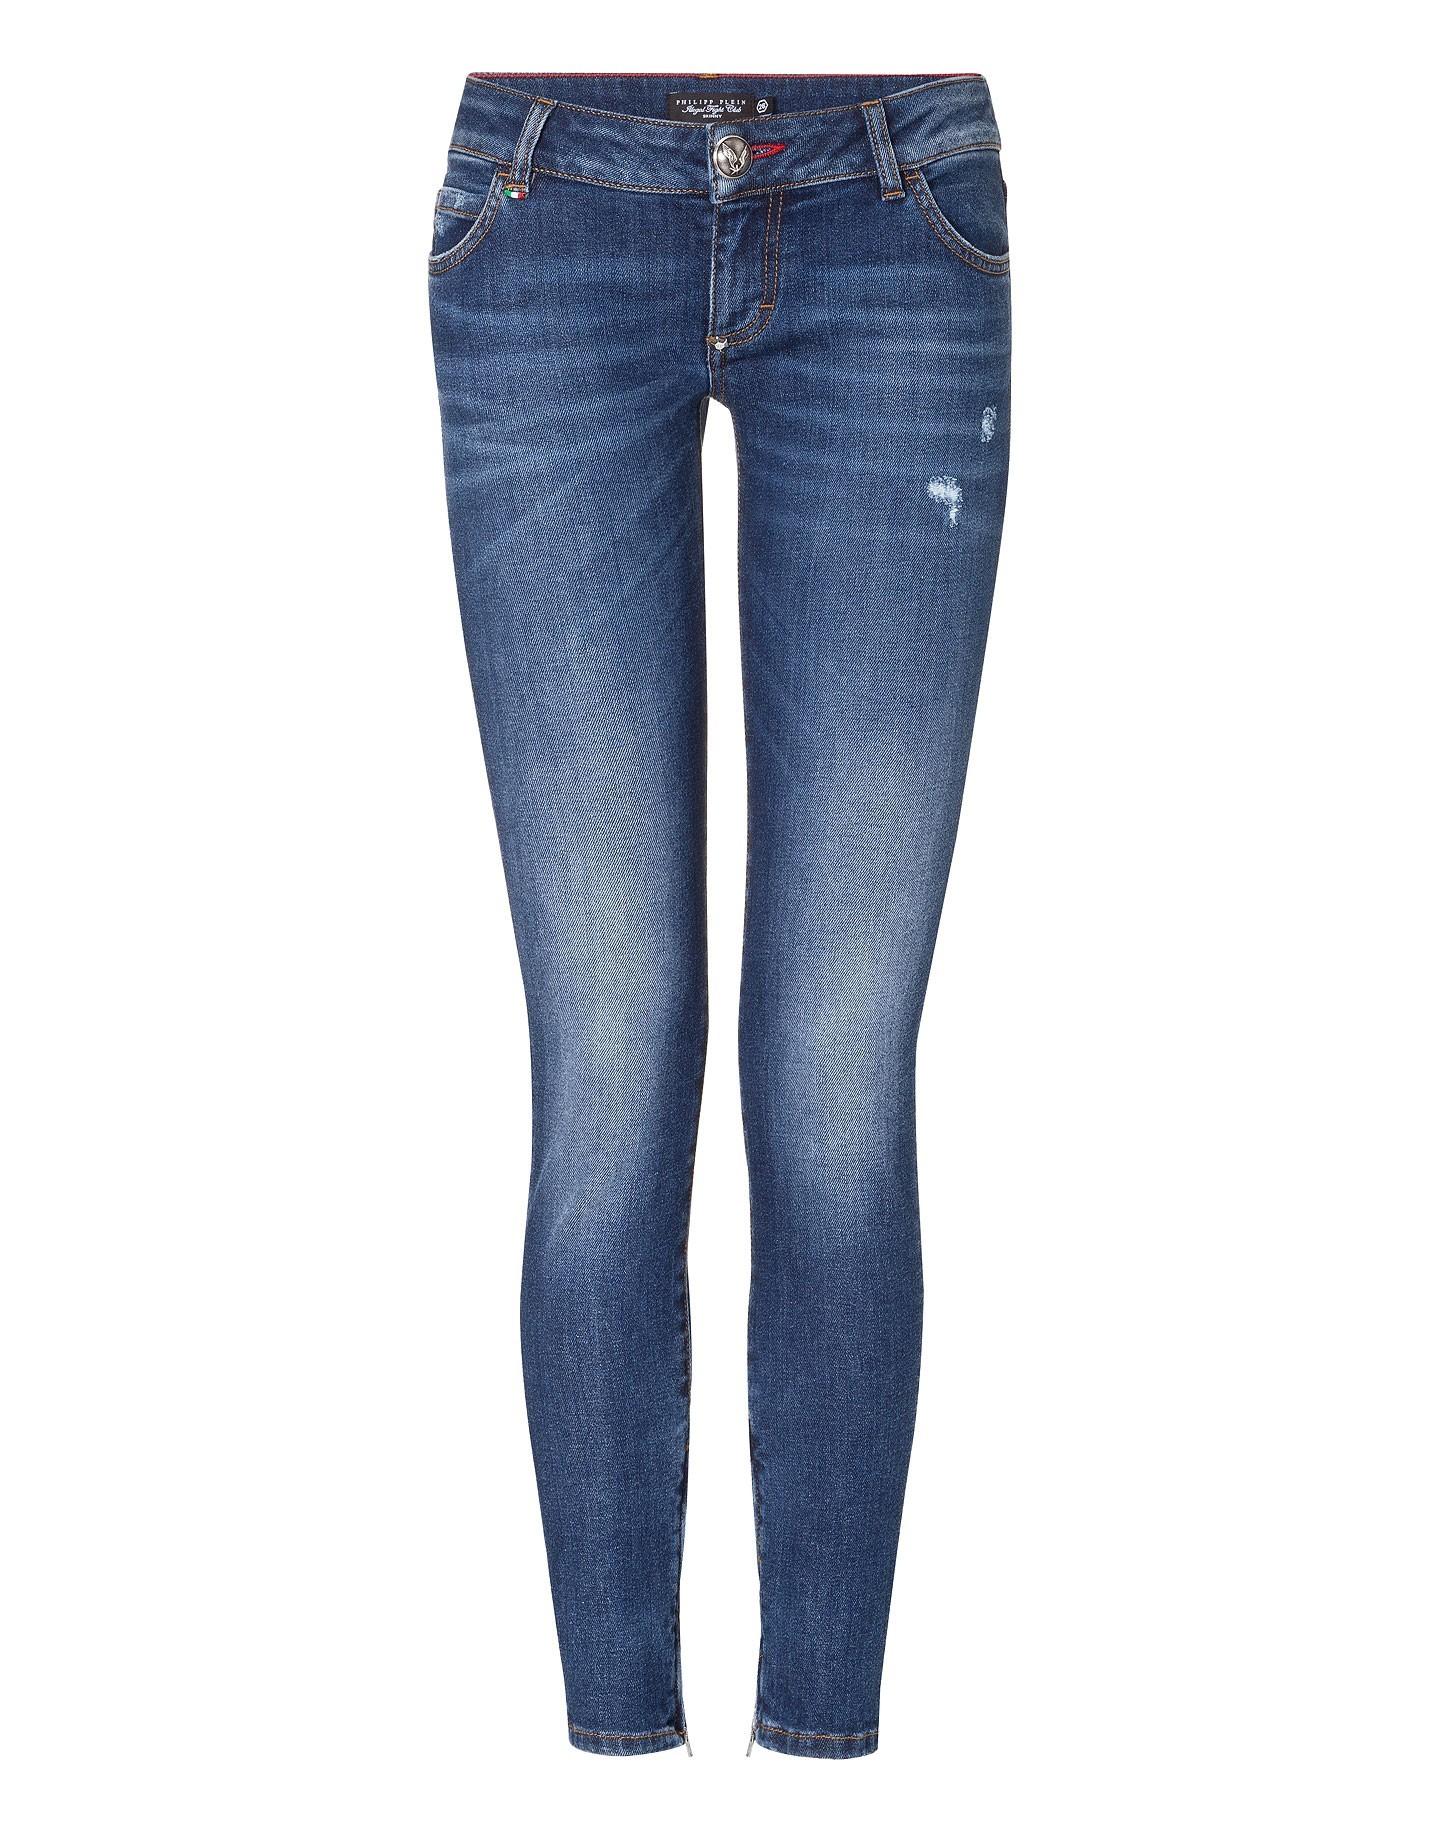 "Philipp plein jeans ""aralia"""